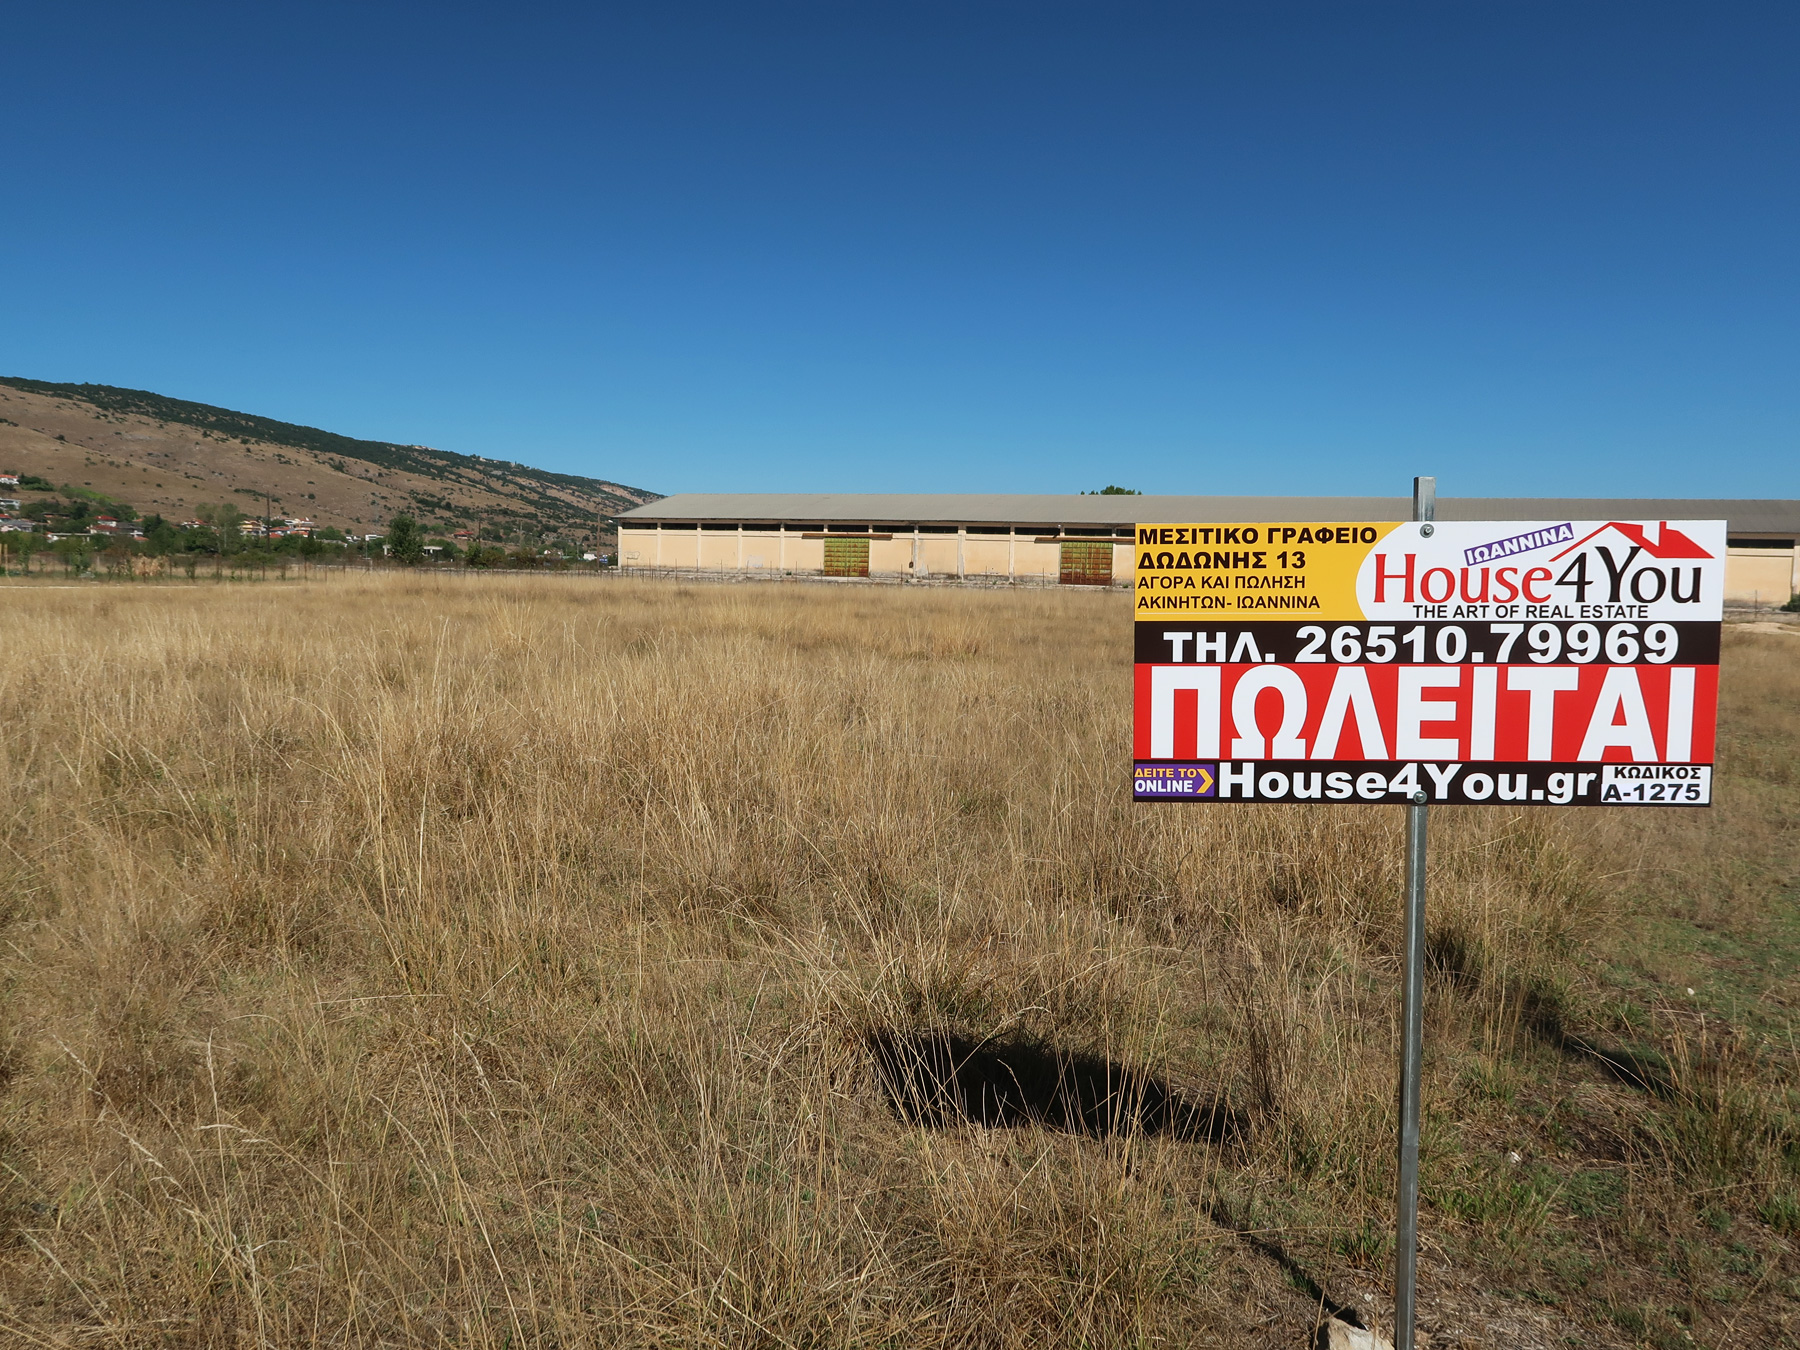 For sale a plot of 7,589 sq.m., the entire OT. in K. Neochoropoulos, Ioannina, near the Earthquake victims